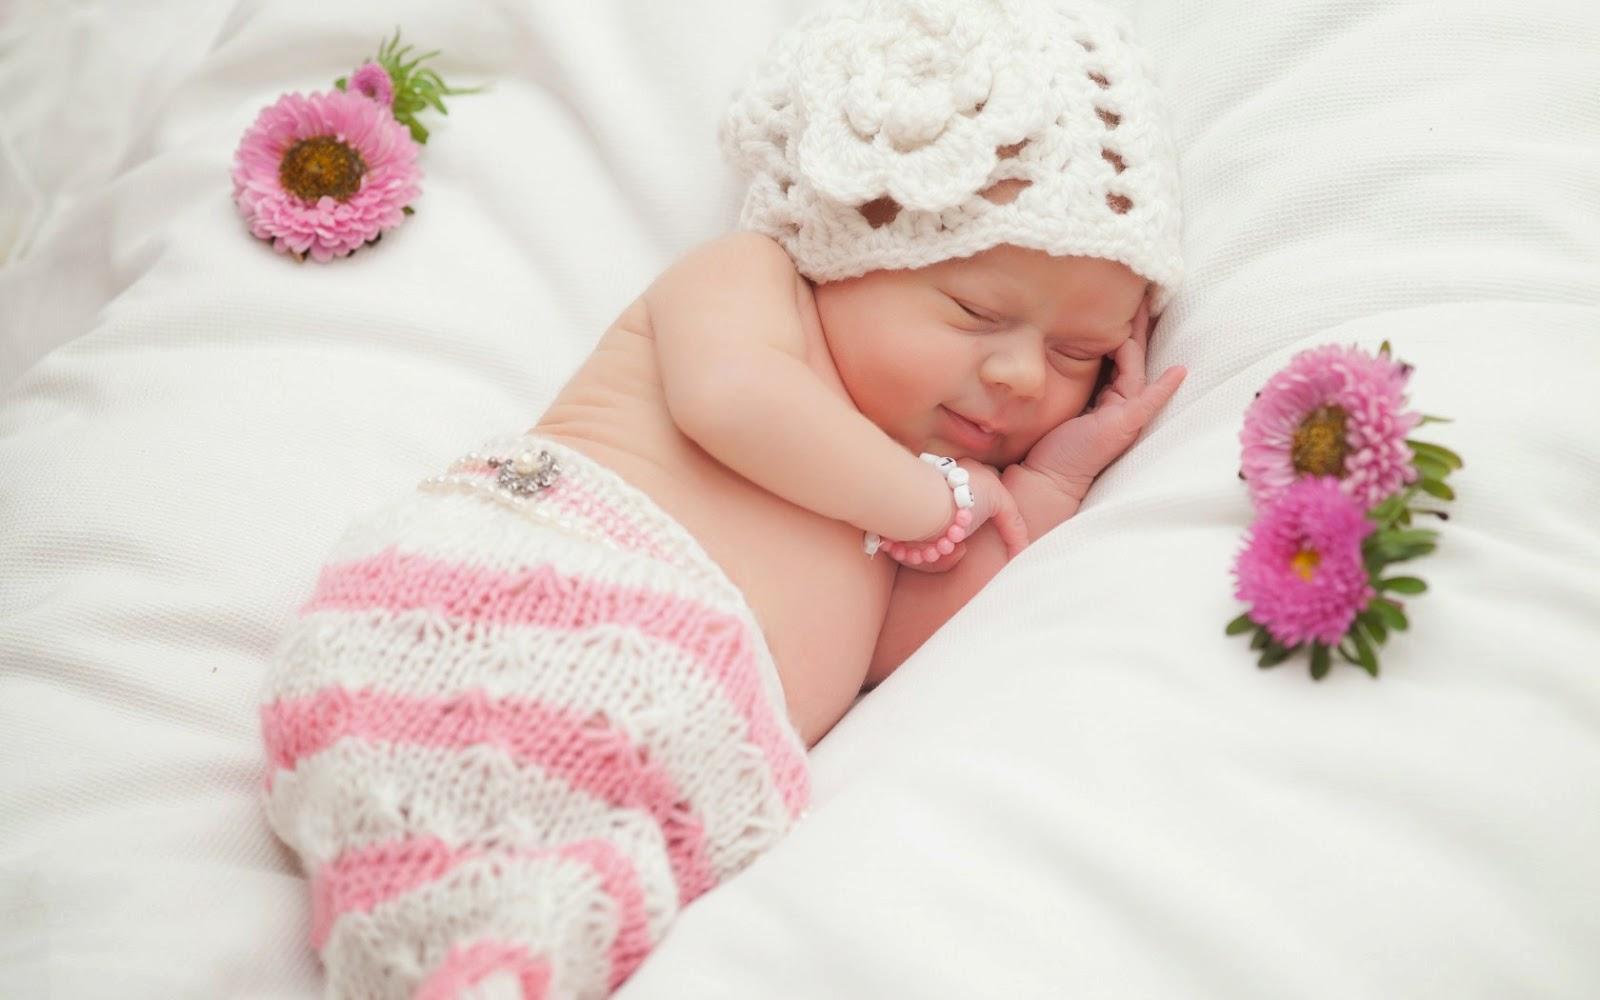 baby wallpapers adorable cute - hd desktop wallpapers | 4k hd